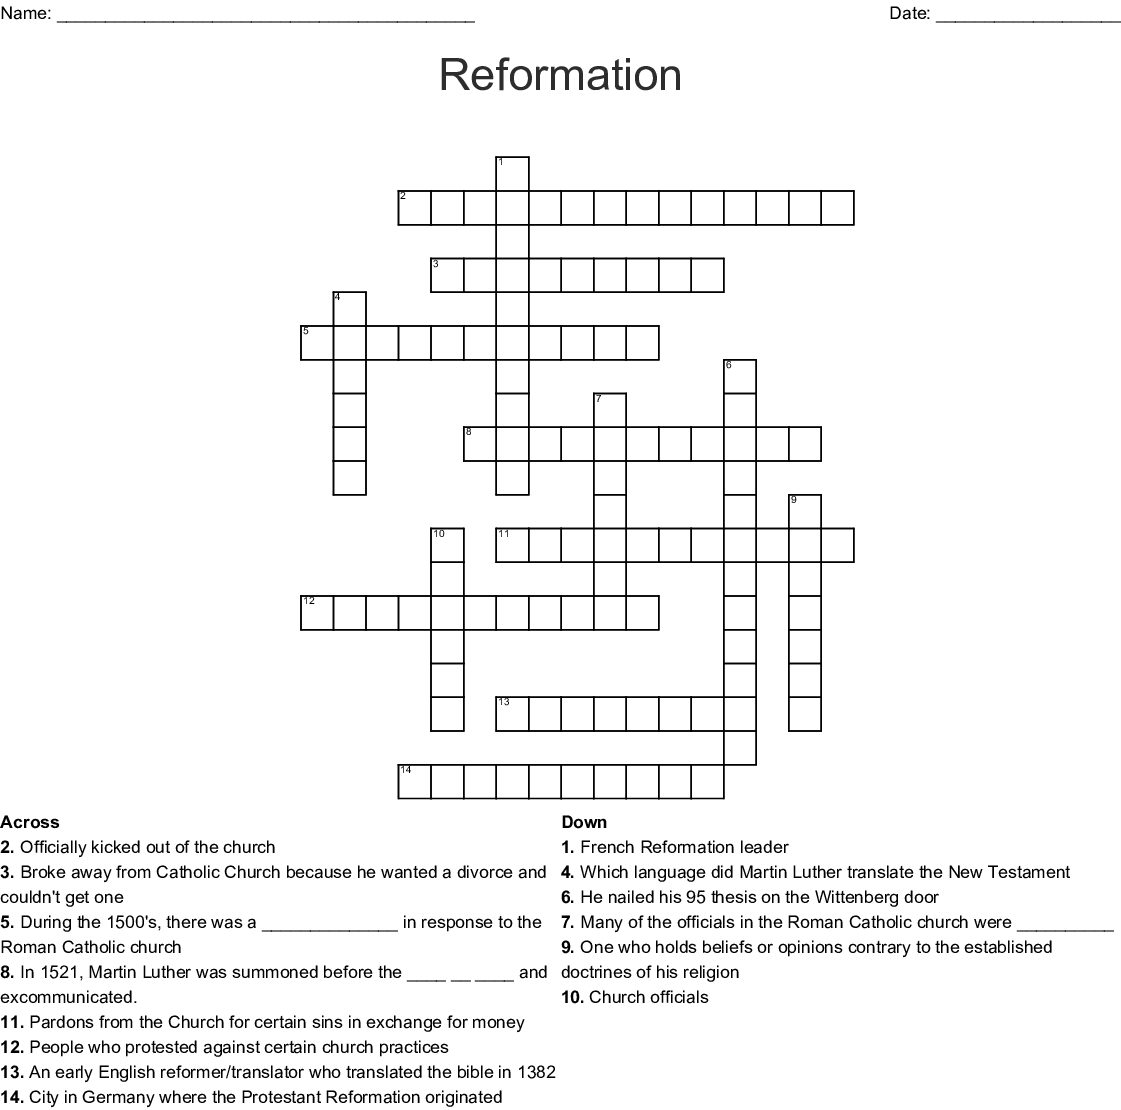 Protestant Reformation Crossword - WordMint